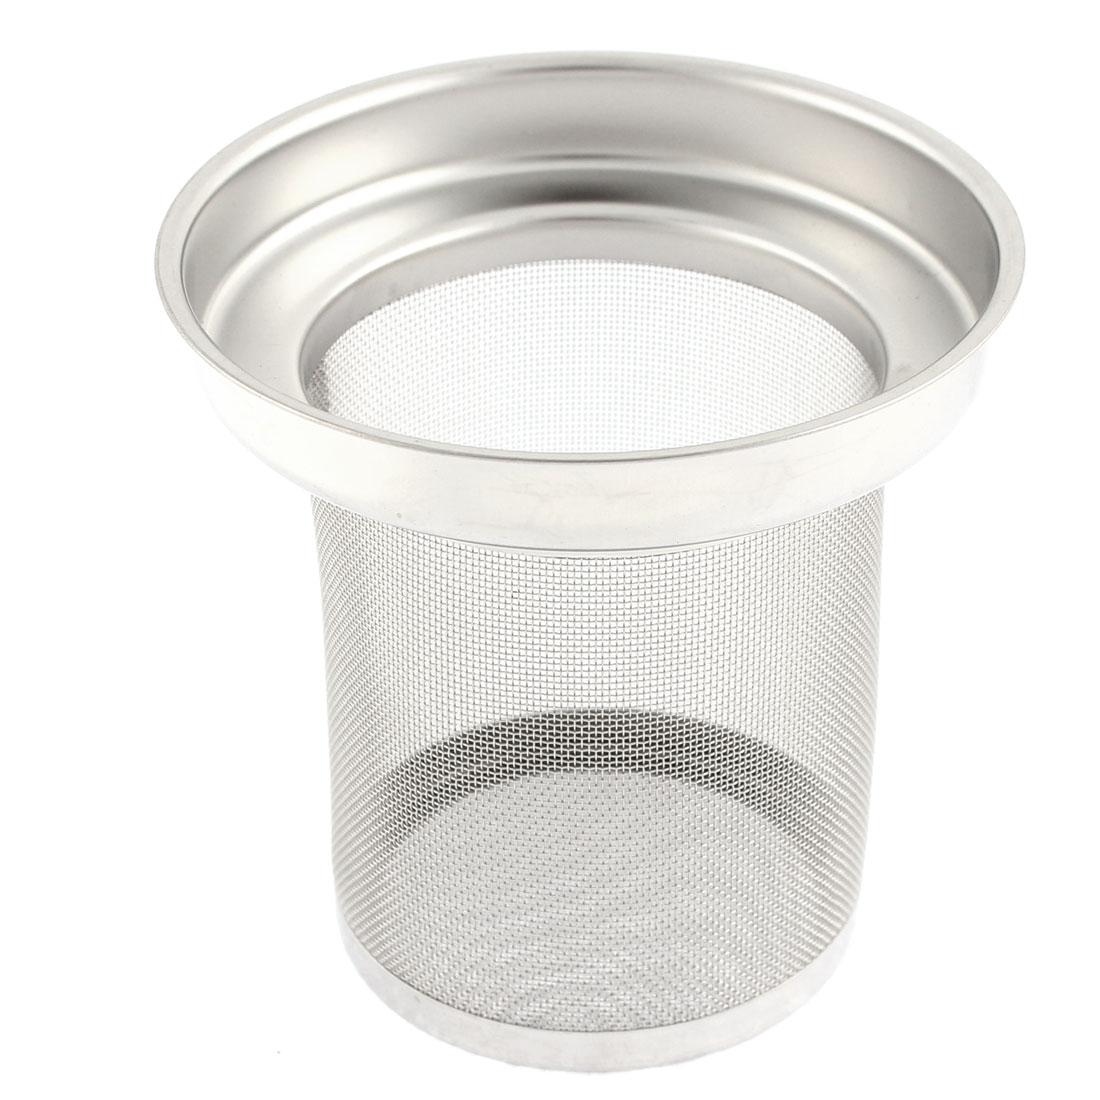 Stainless Steel Mesh Filter Loose Leaf Spice Ball Tea Infuser Strainer